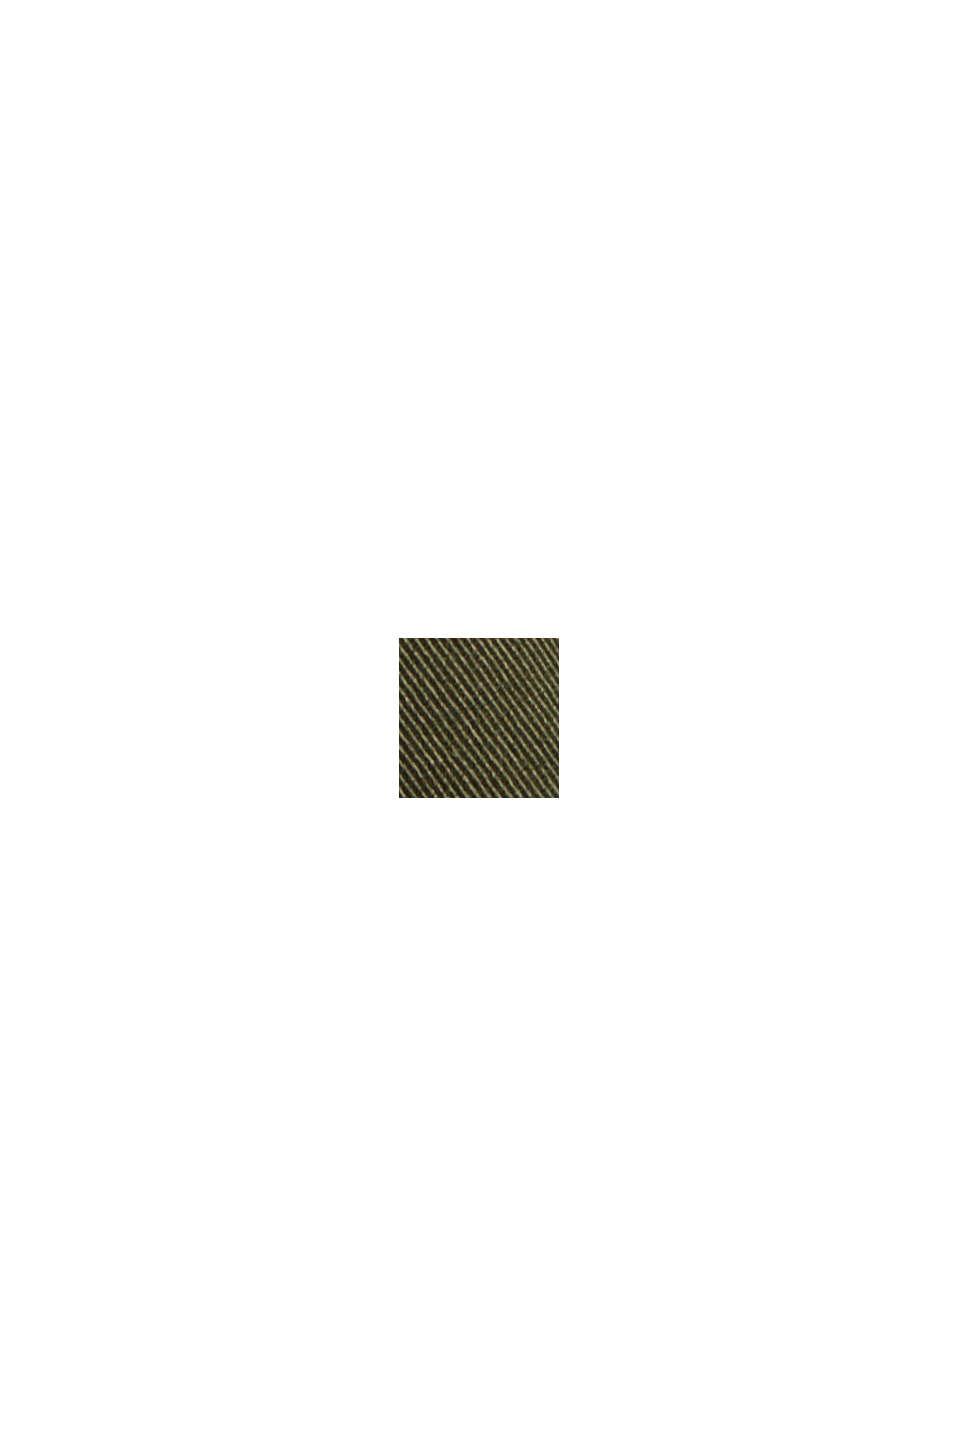 Zkrácené kalhoty s bio bavlnou a vlákny COOLMAX®, DARK KHAKI, swatch